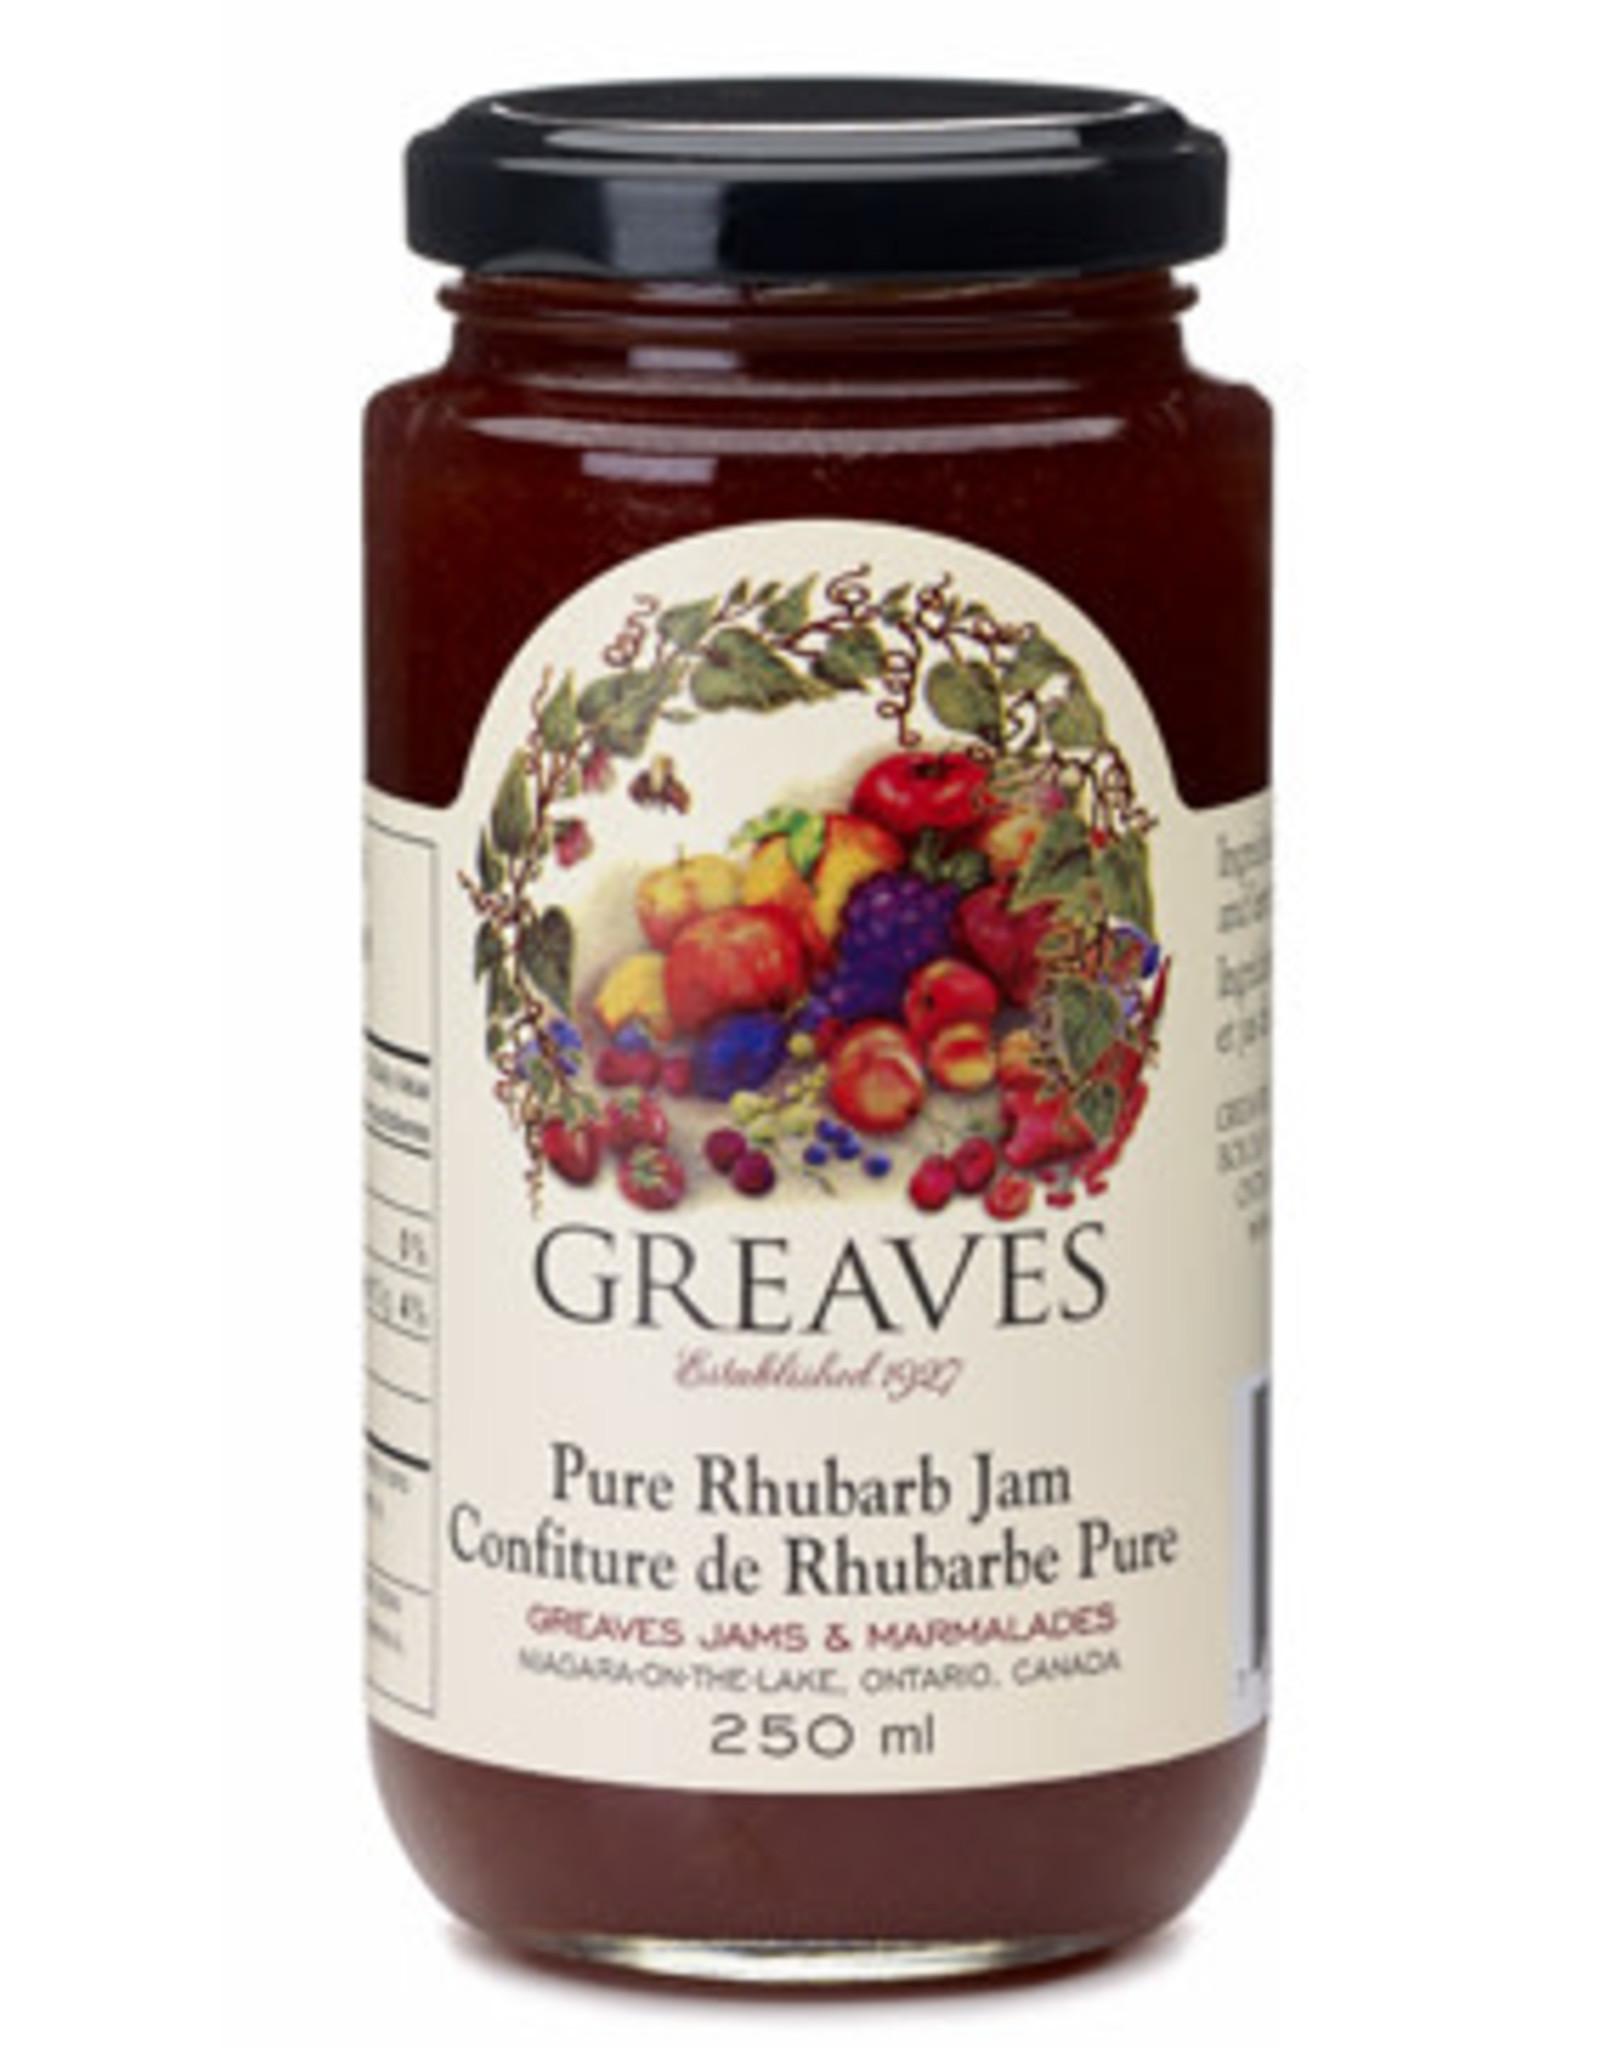 Greaves Jams & Marmalades Ltd. Greaves, Rhubarb Jam, 250ml